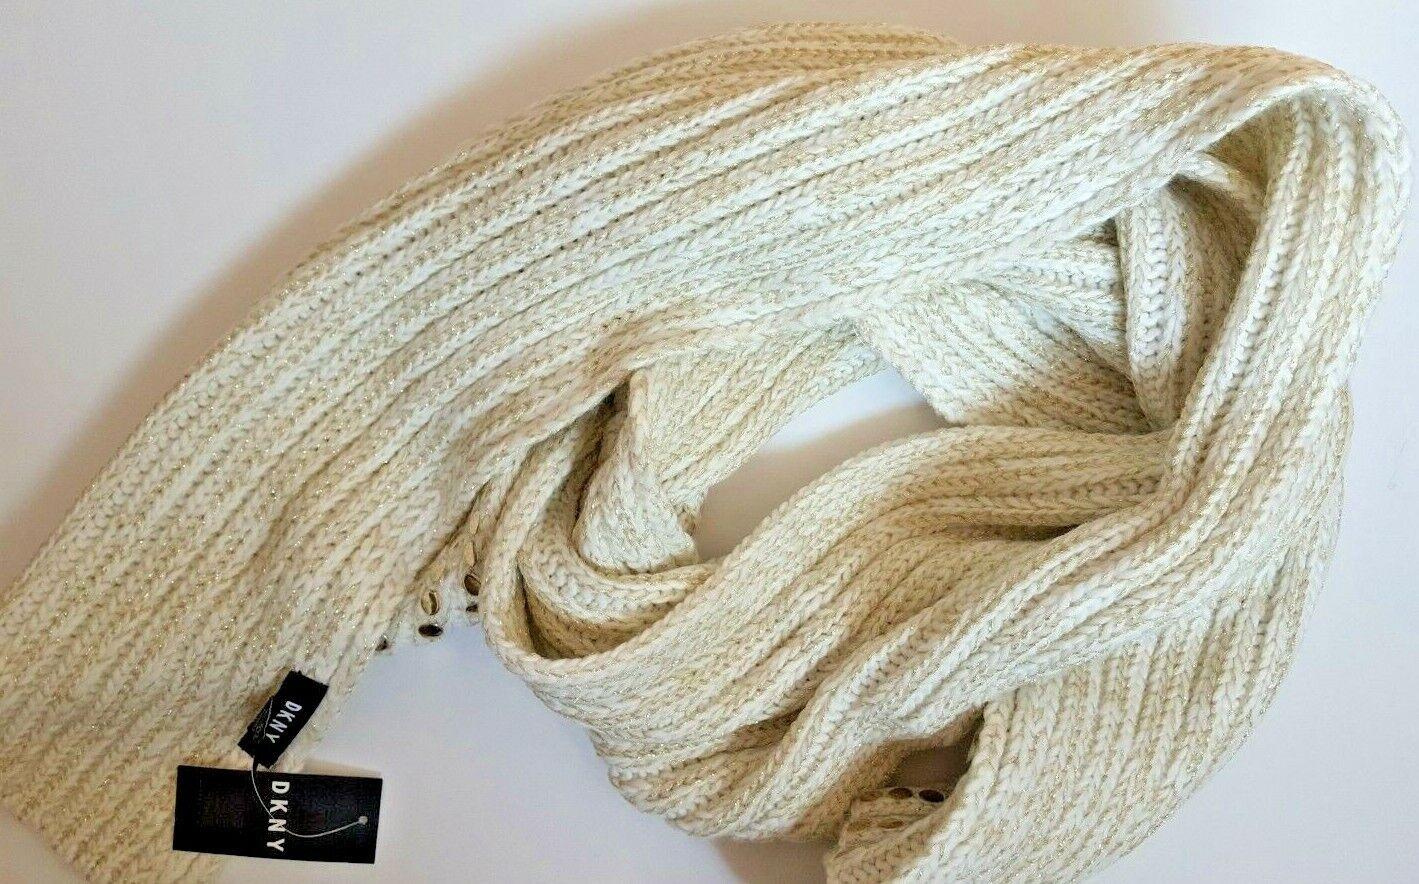 DKNY Women/'s Knit Scarf Chunky Knit Beige Gold Thread Studded Acrylic Blend NEW